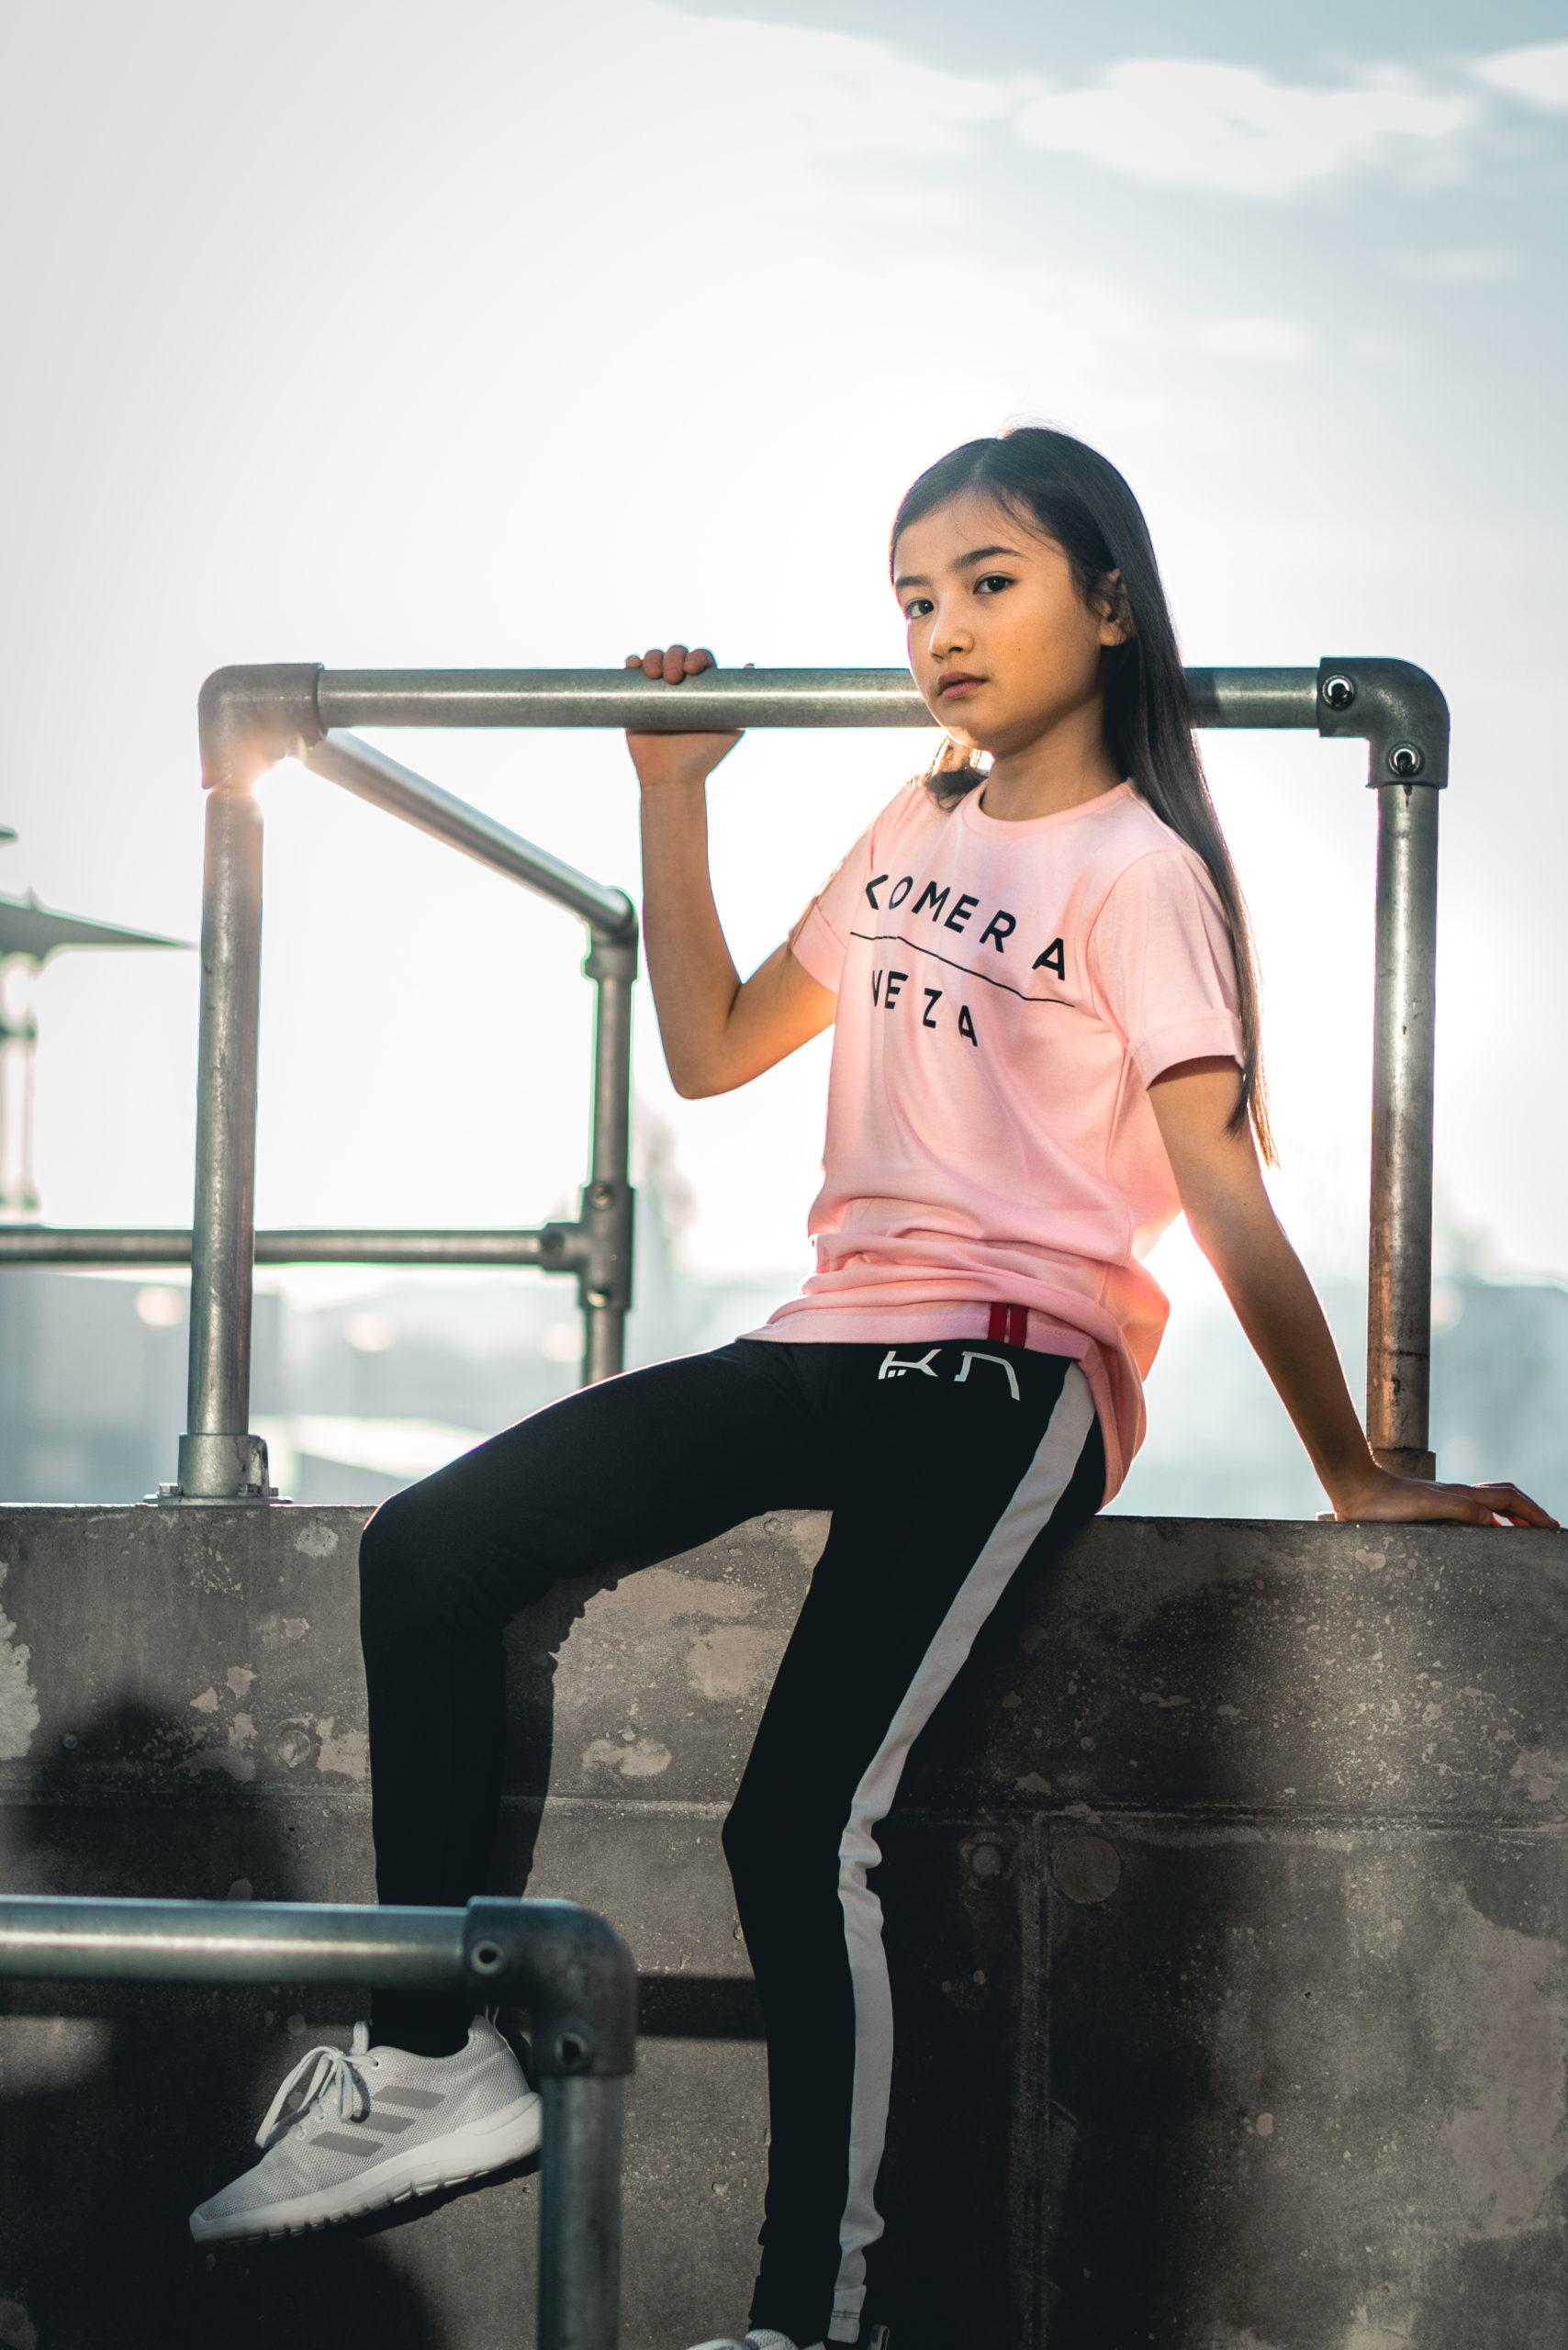 kids pink t-shirt with black komera neza print logo